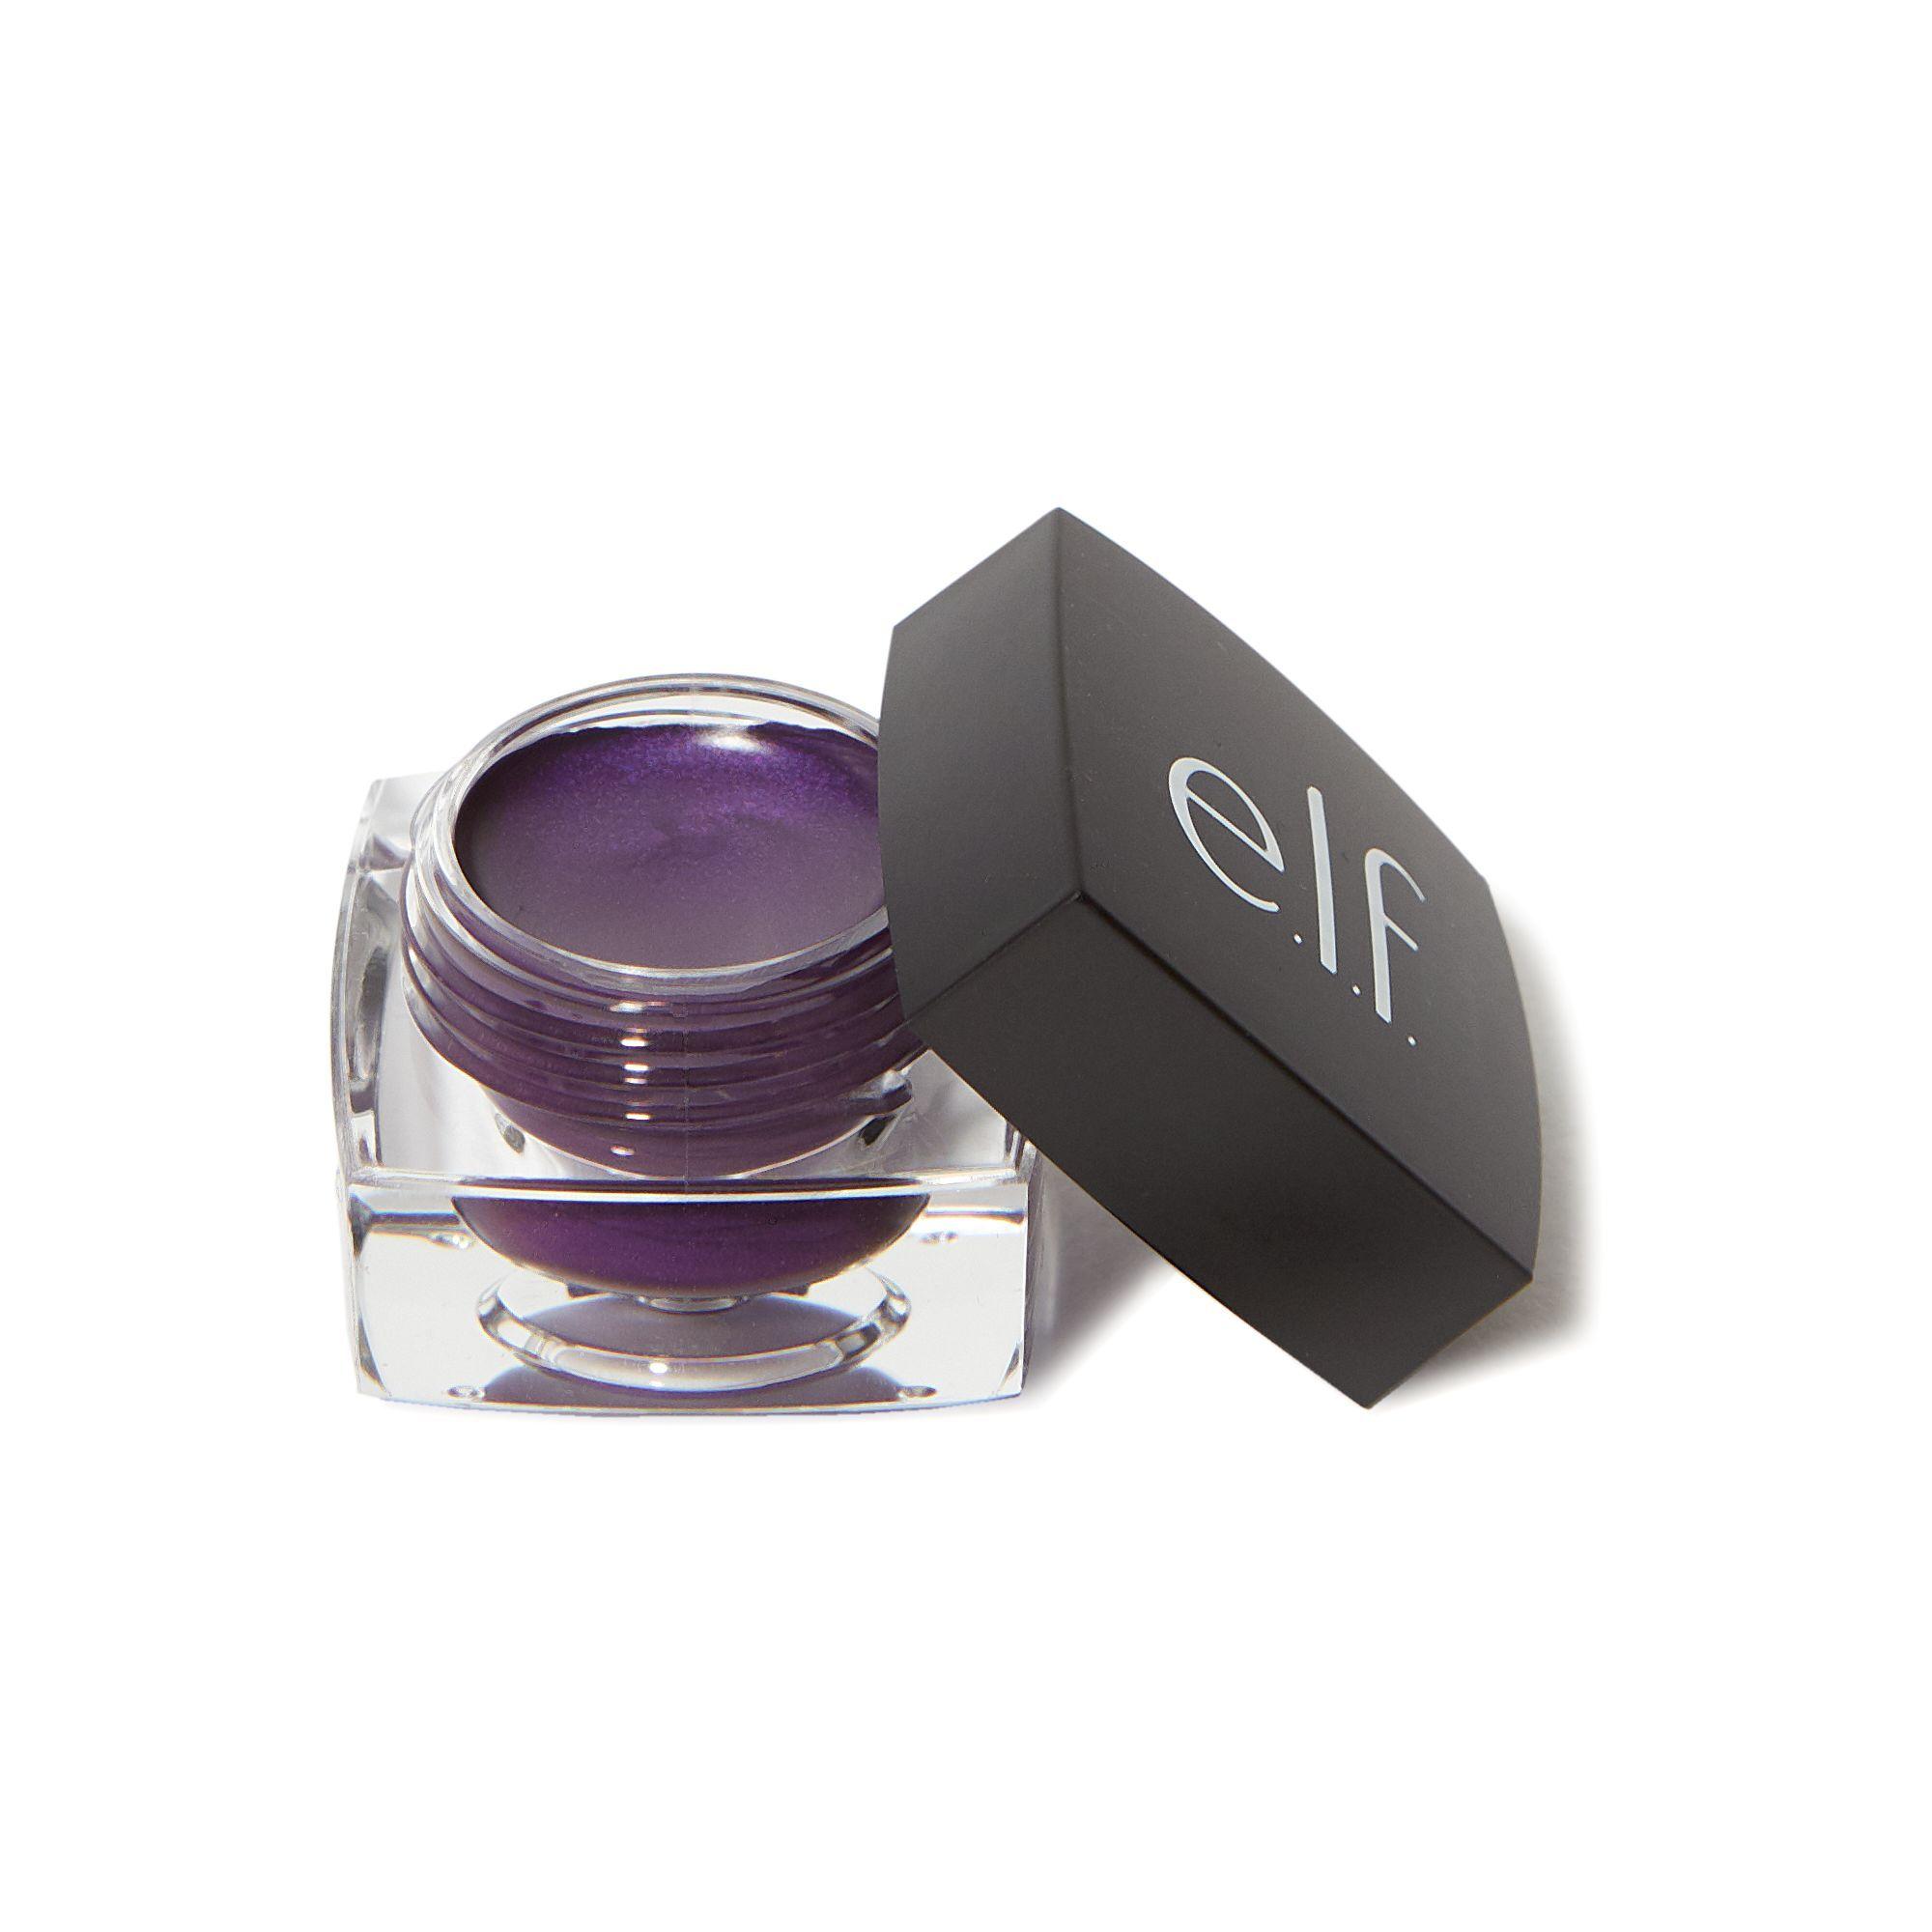 elf Cream Eyeliner Pot Smudge Proof Eyeliner Cream